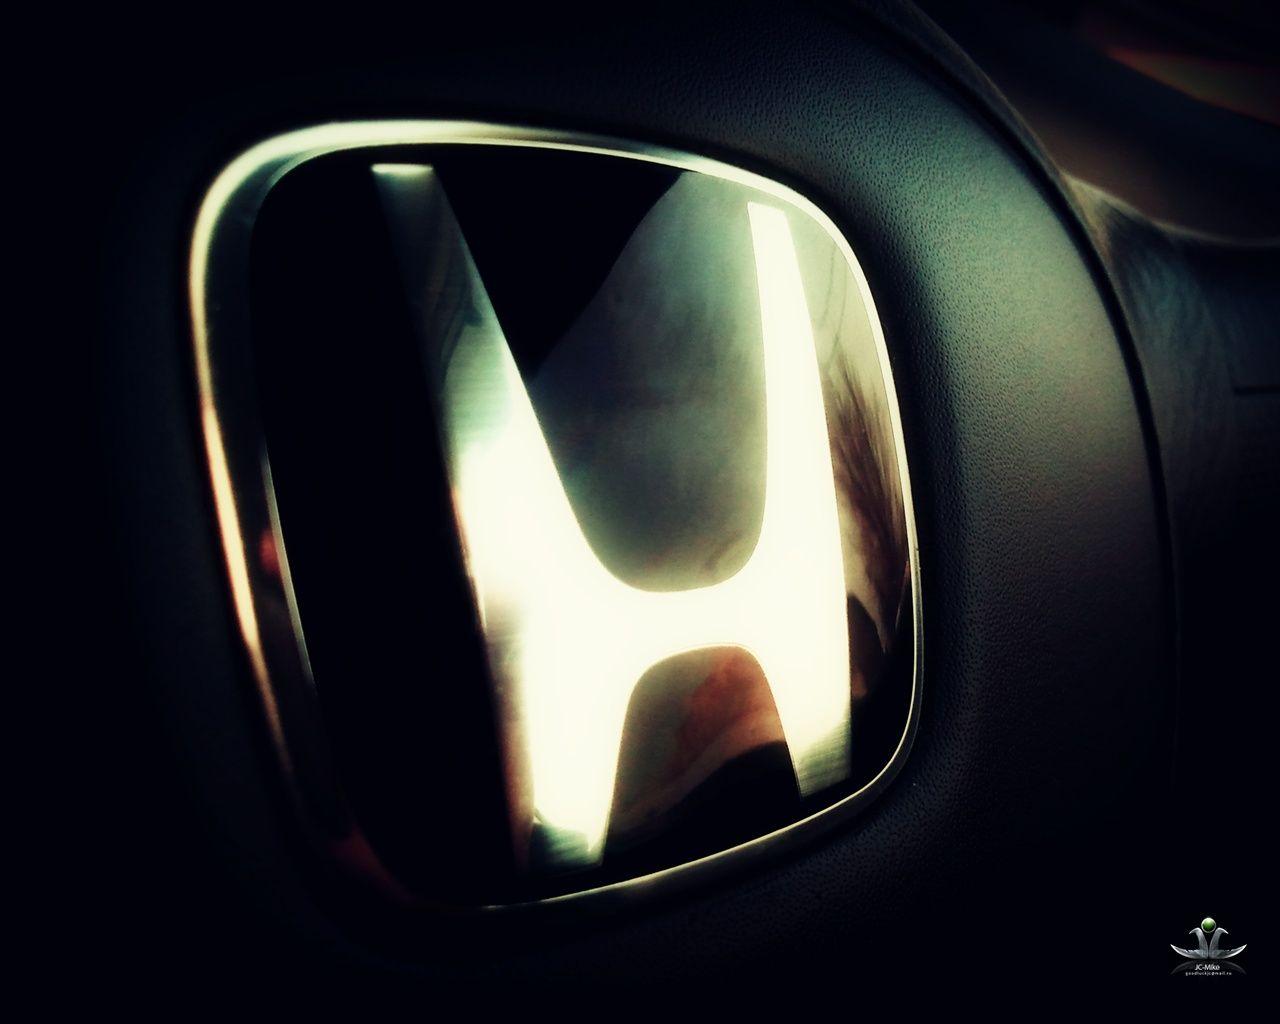 Honda Logo Wallpaper 1280x1024 Download